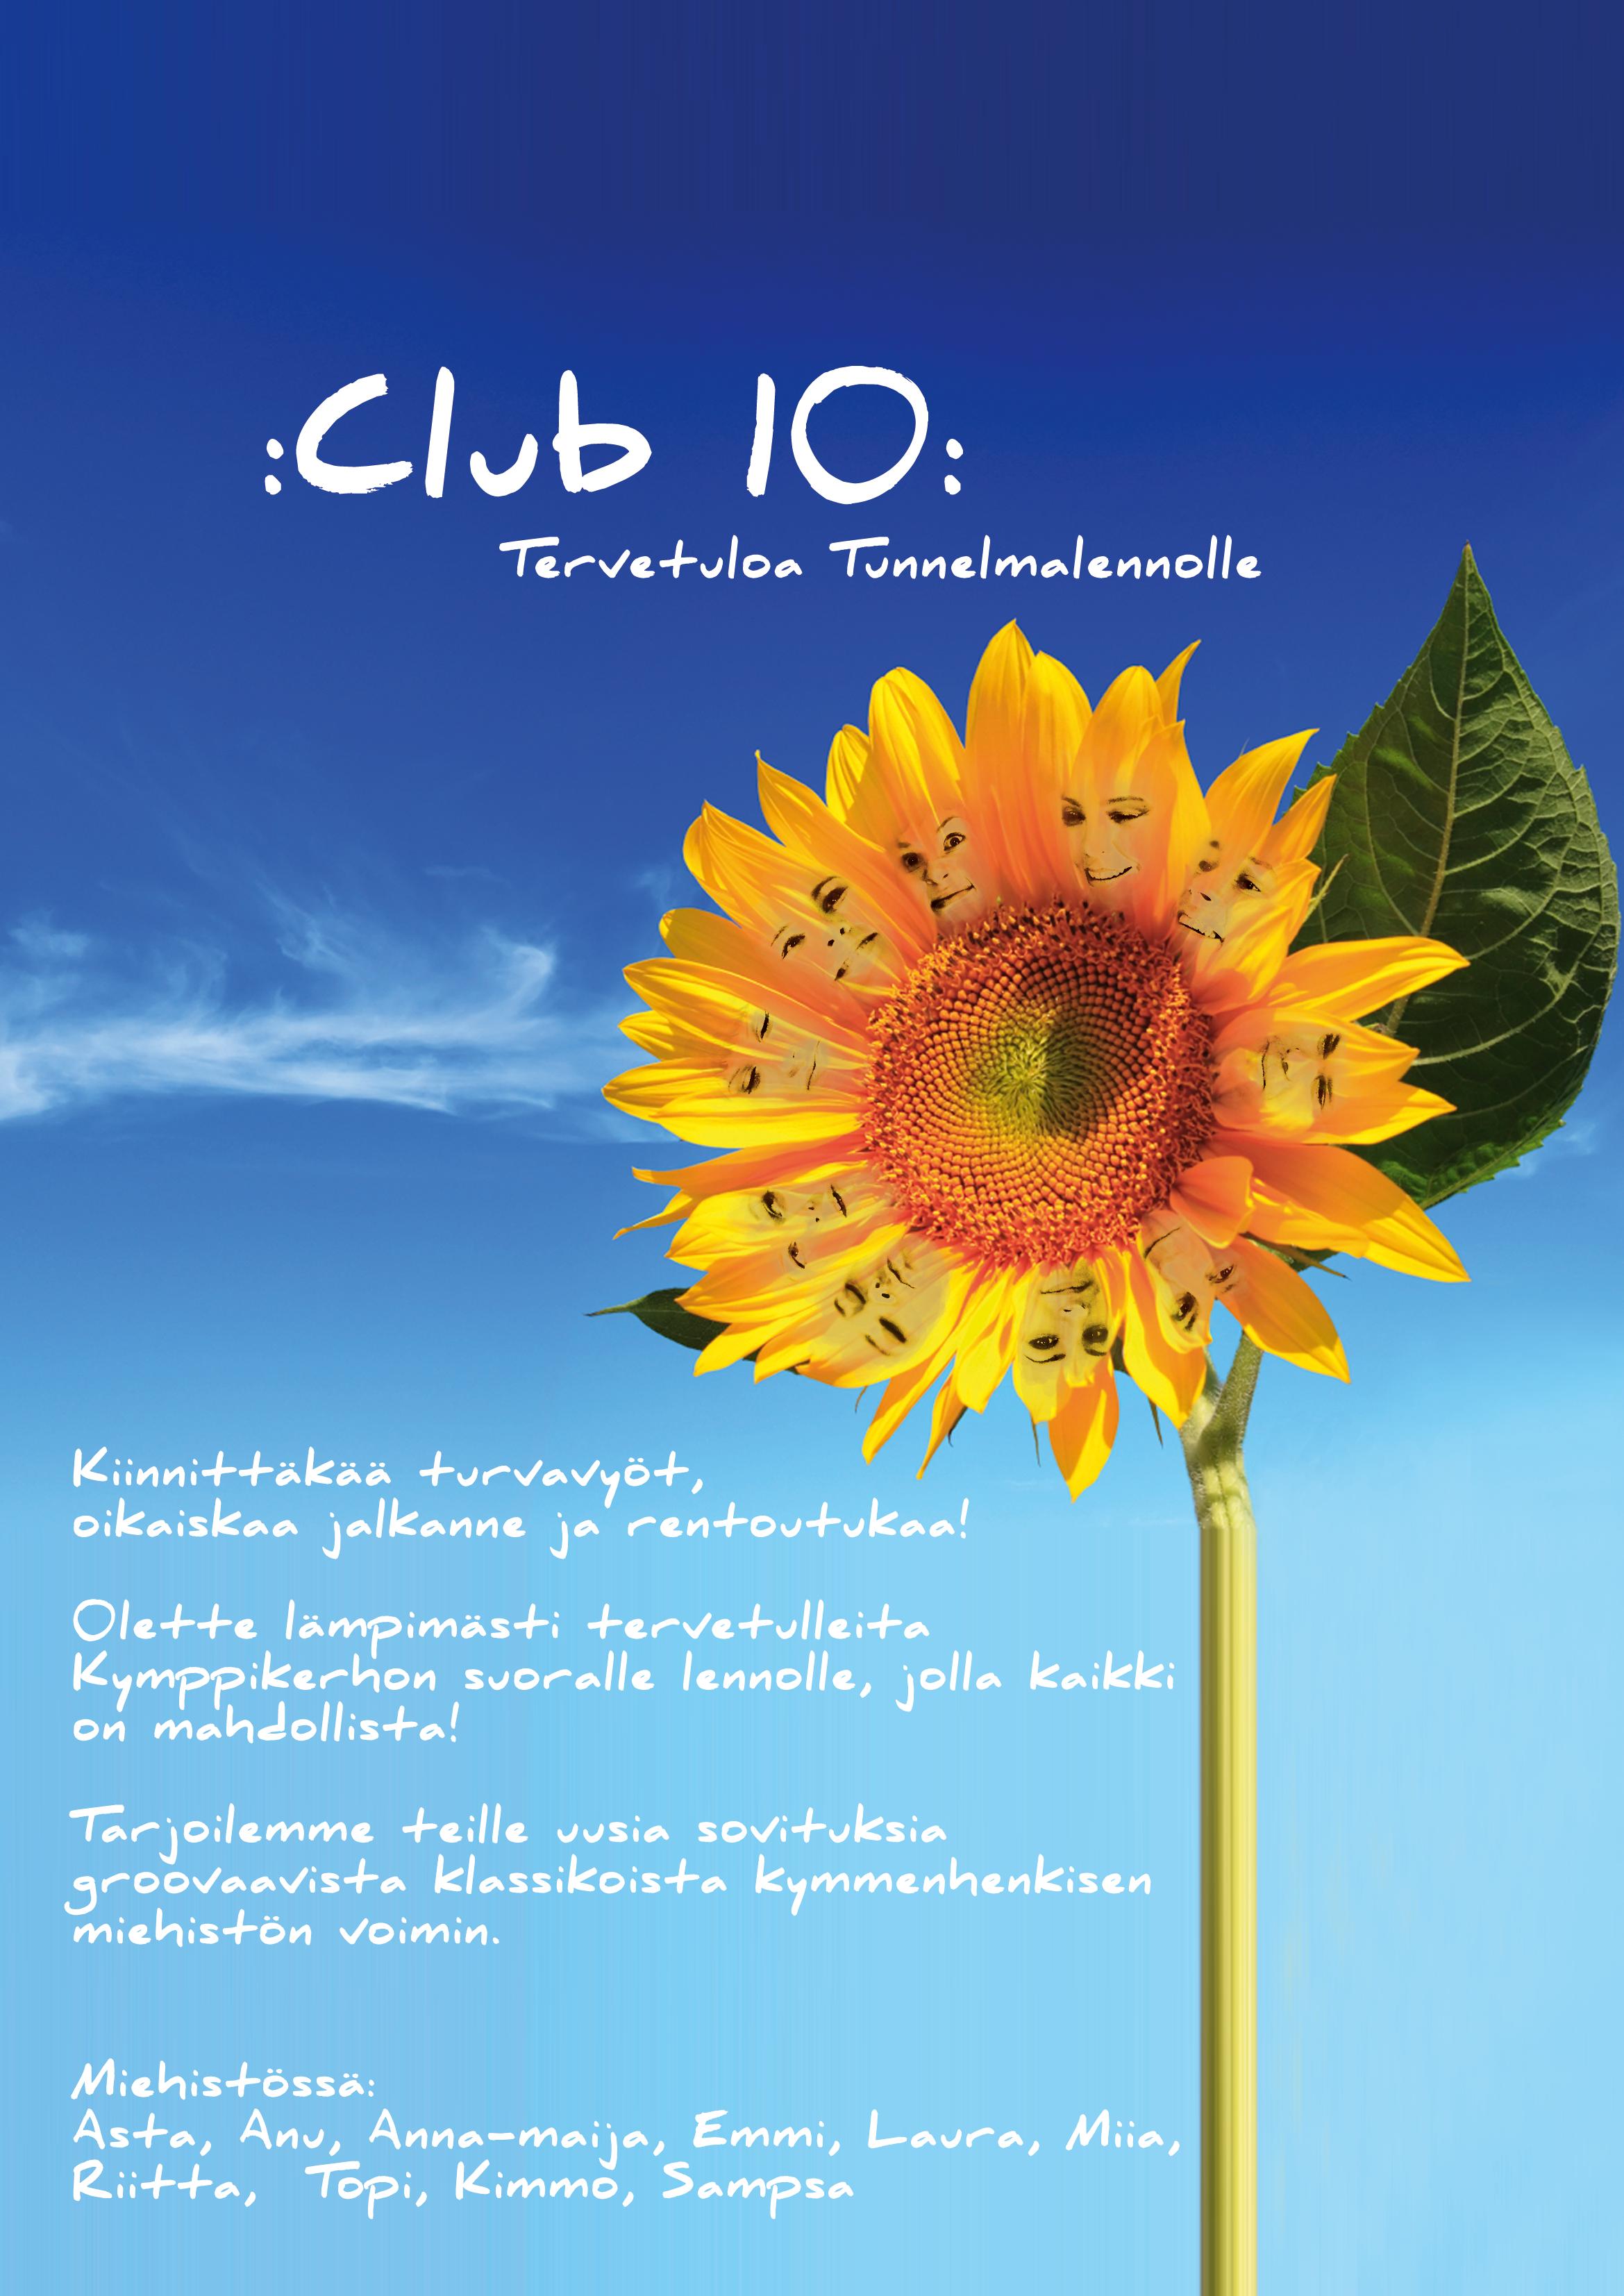 club10_tunnelmalento.png